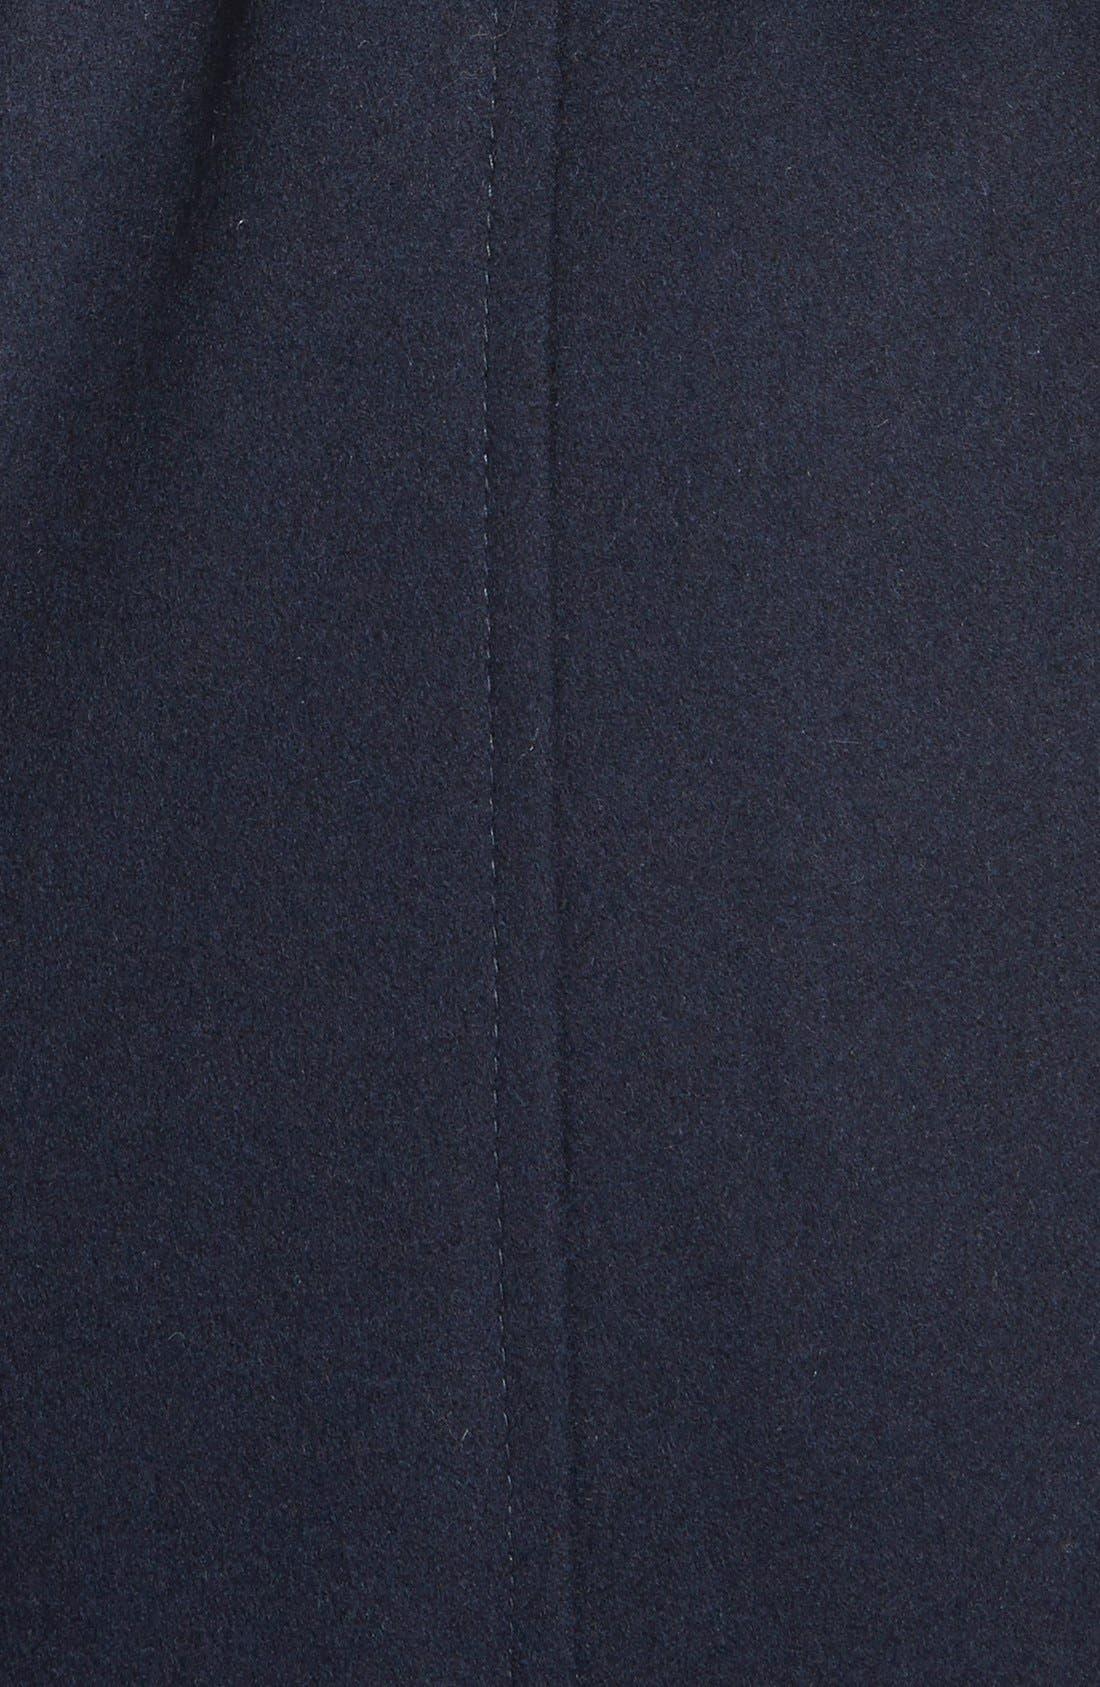 Faux Leather & Faux Fur Trim Belted Wool Blend Coat,                             Alternate thumbnail 15, color,